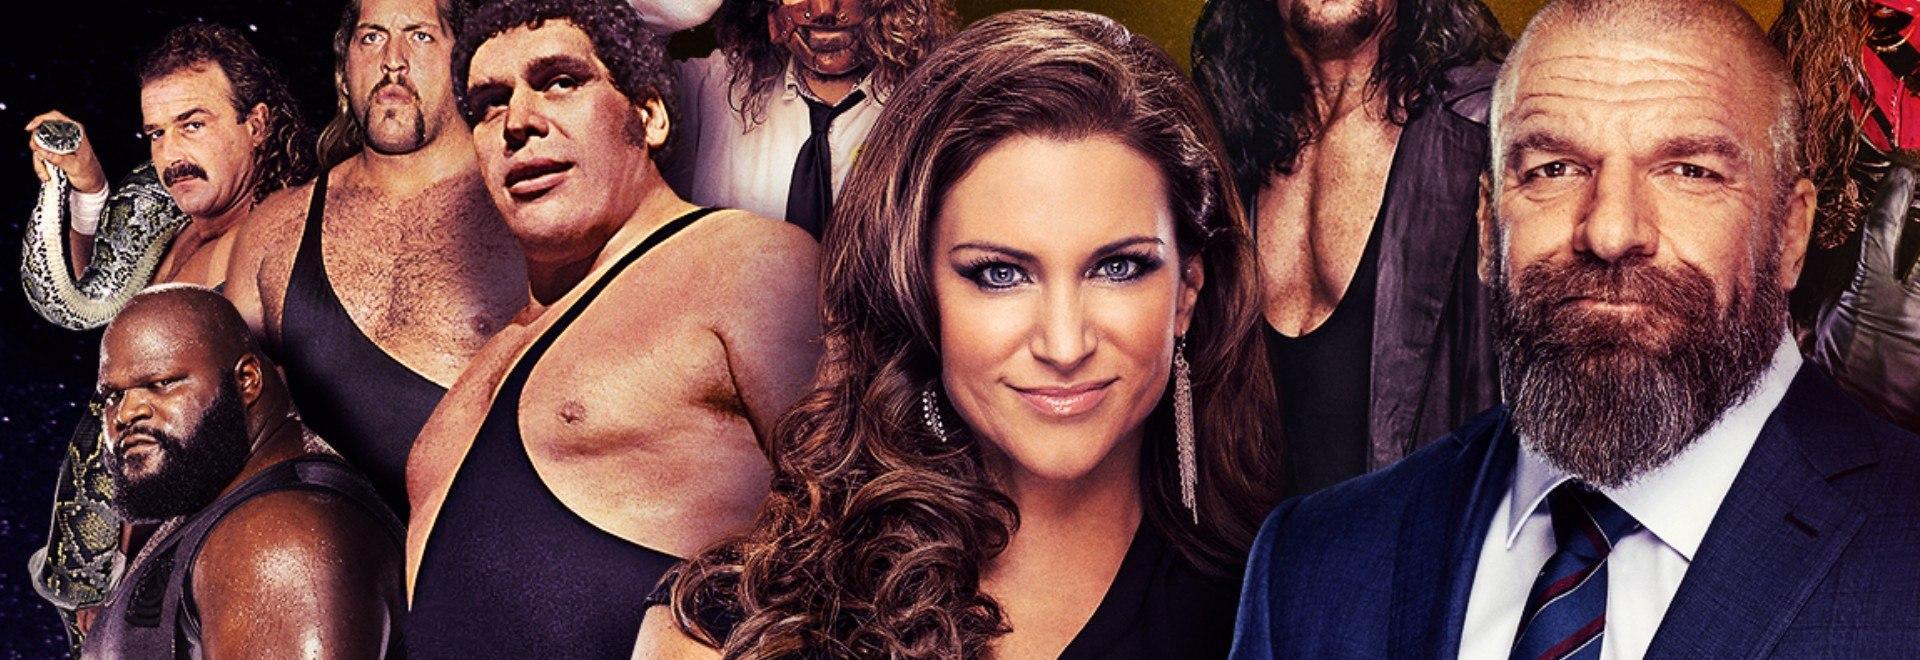 Undertaker e la maschera di Kane